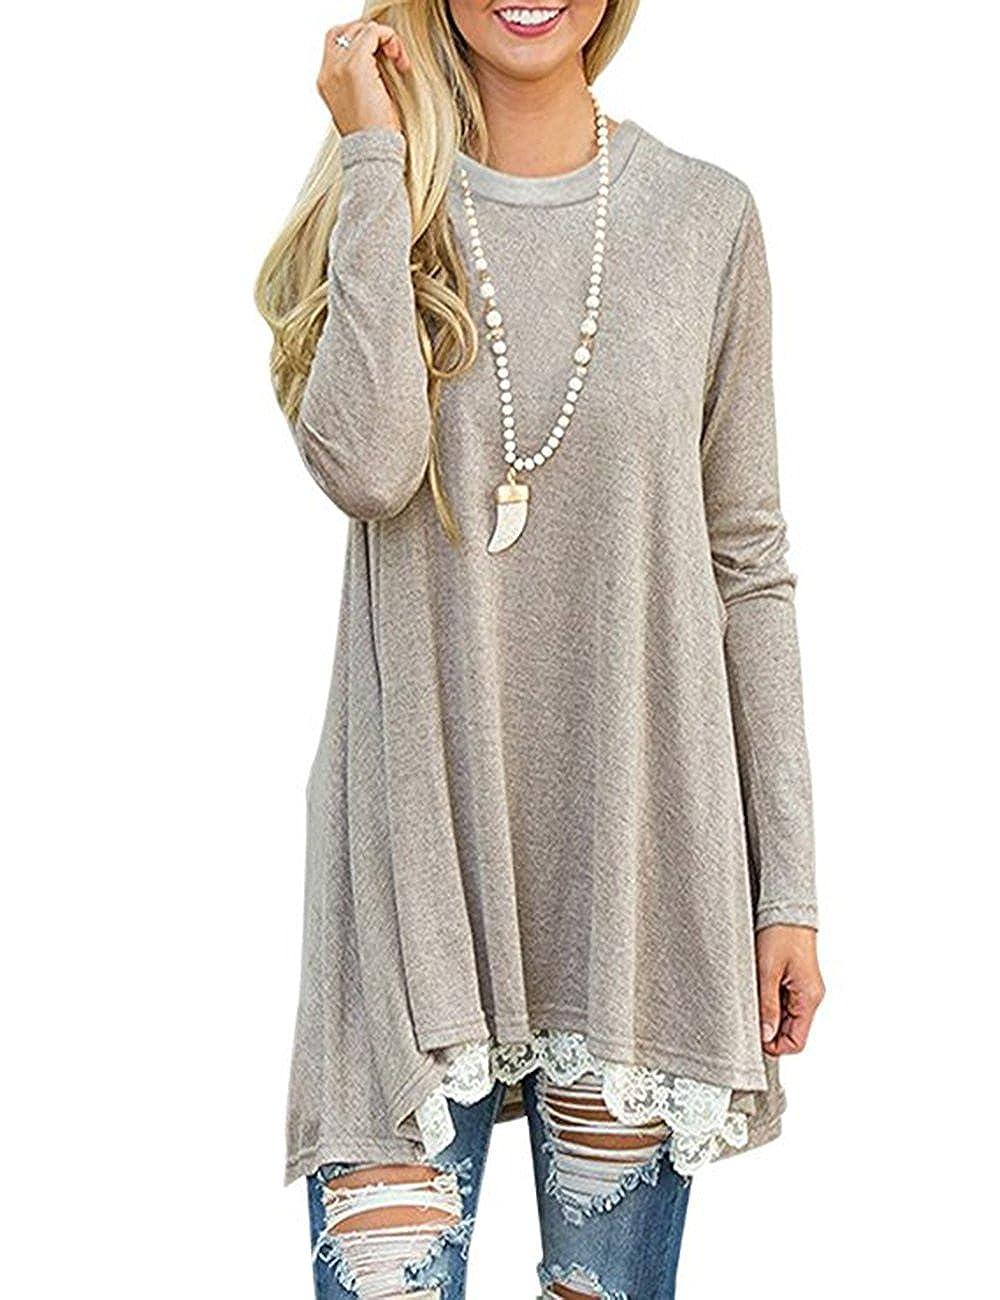 5b8cb332ac Top 10 wholesale Long Tunic Shirt Dress - Chinabrands.com